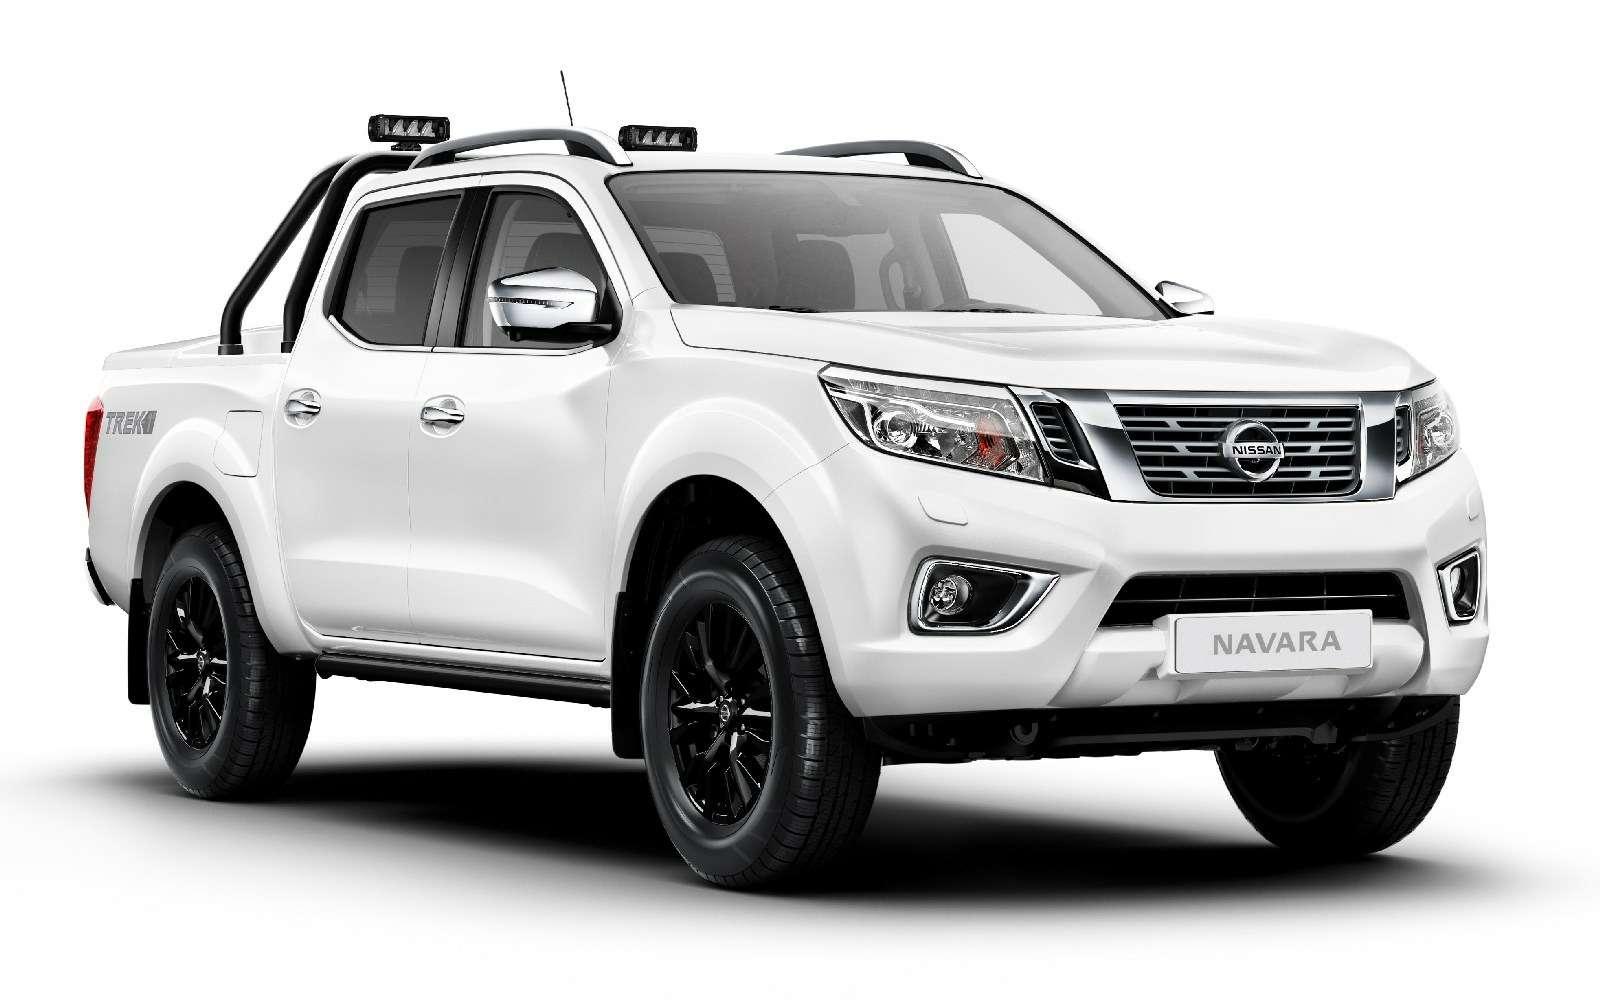 Пикап подградусом: Nissan Navara предстал вэксклюзивном наряде— фото 692387